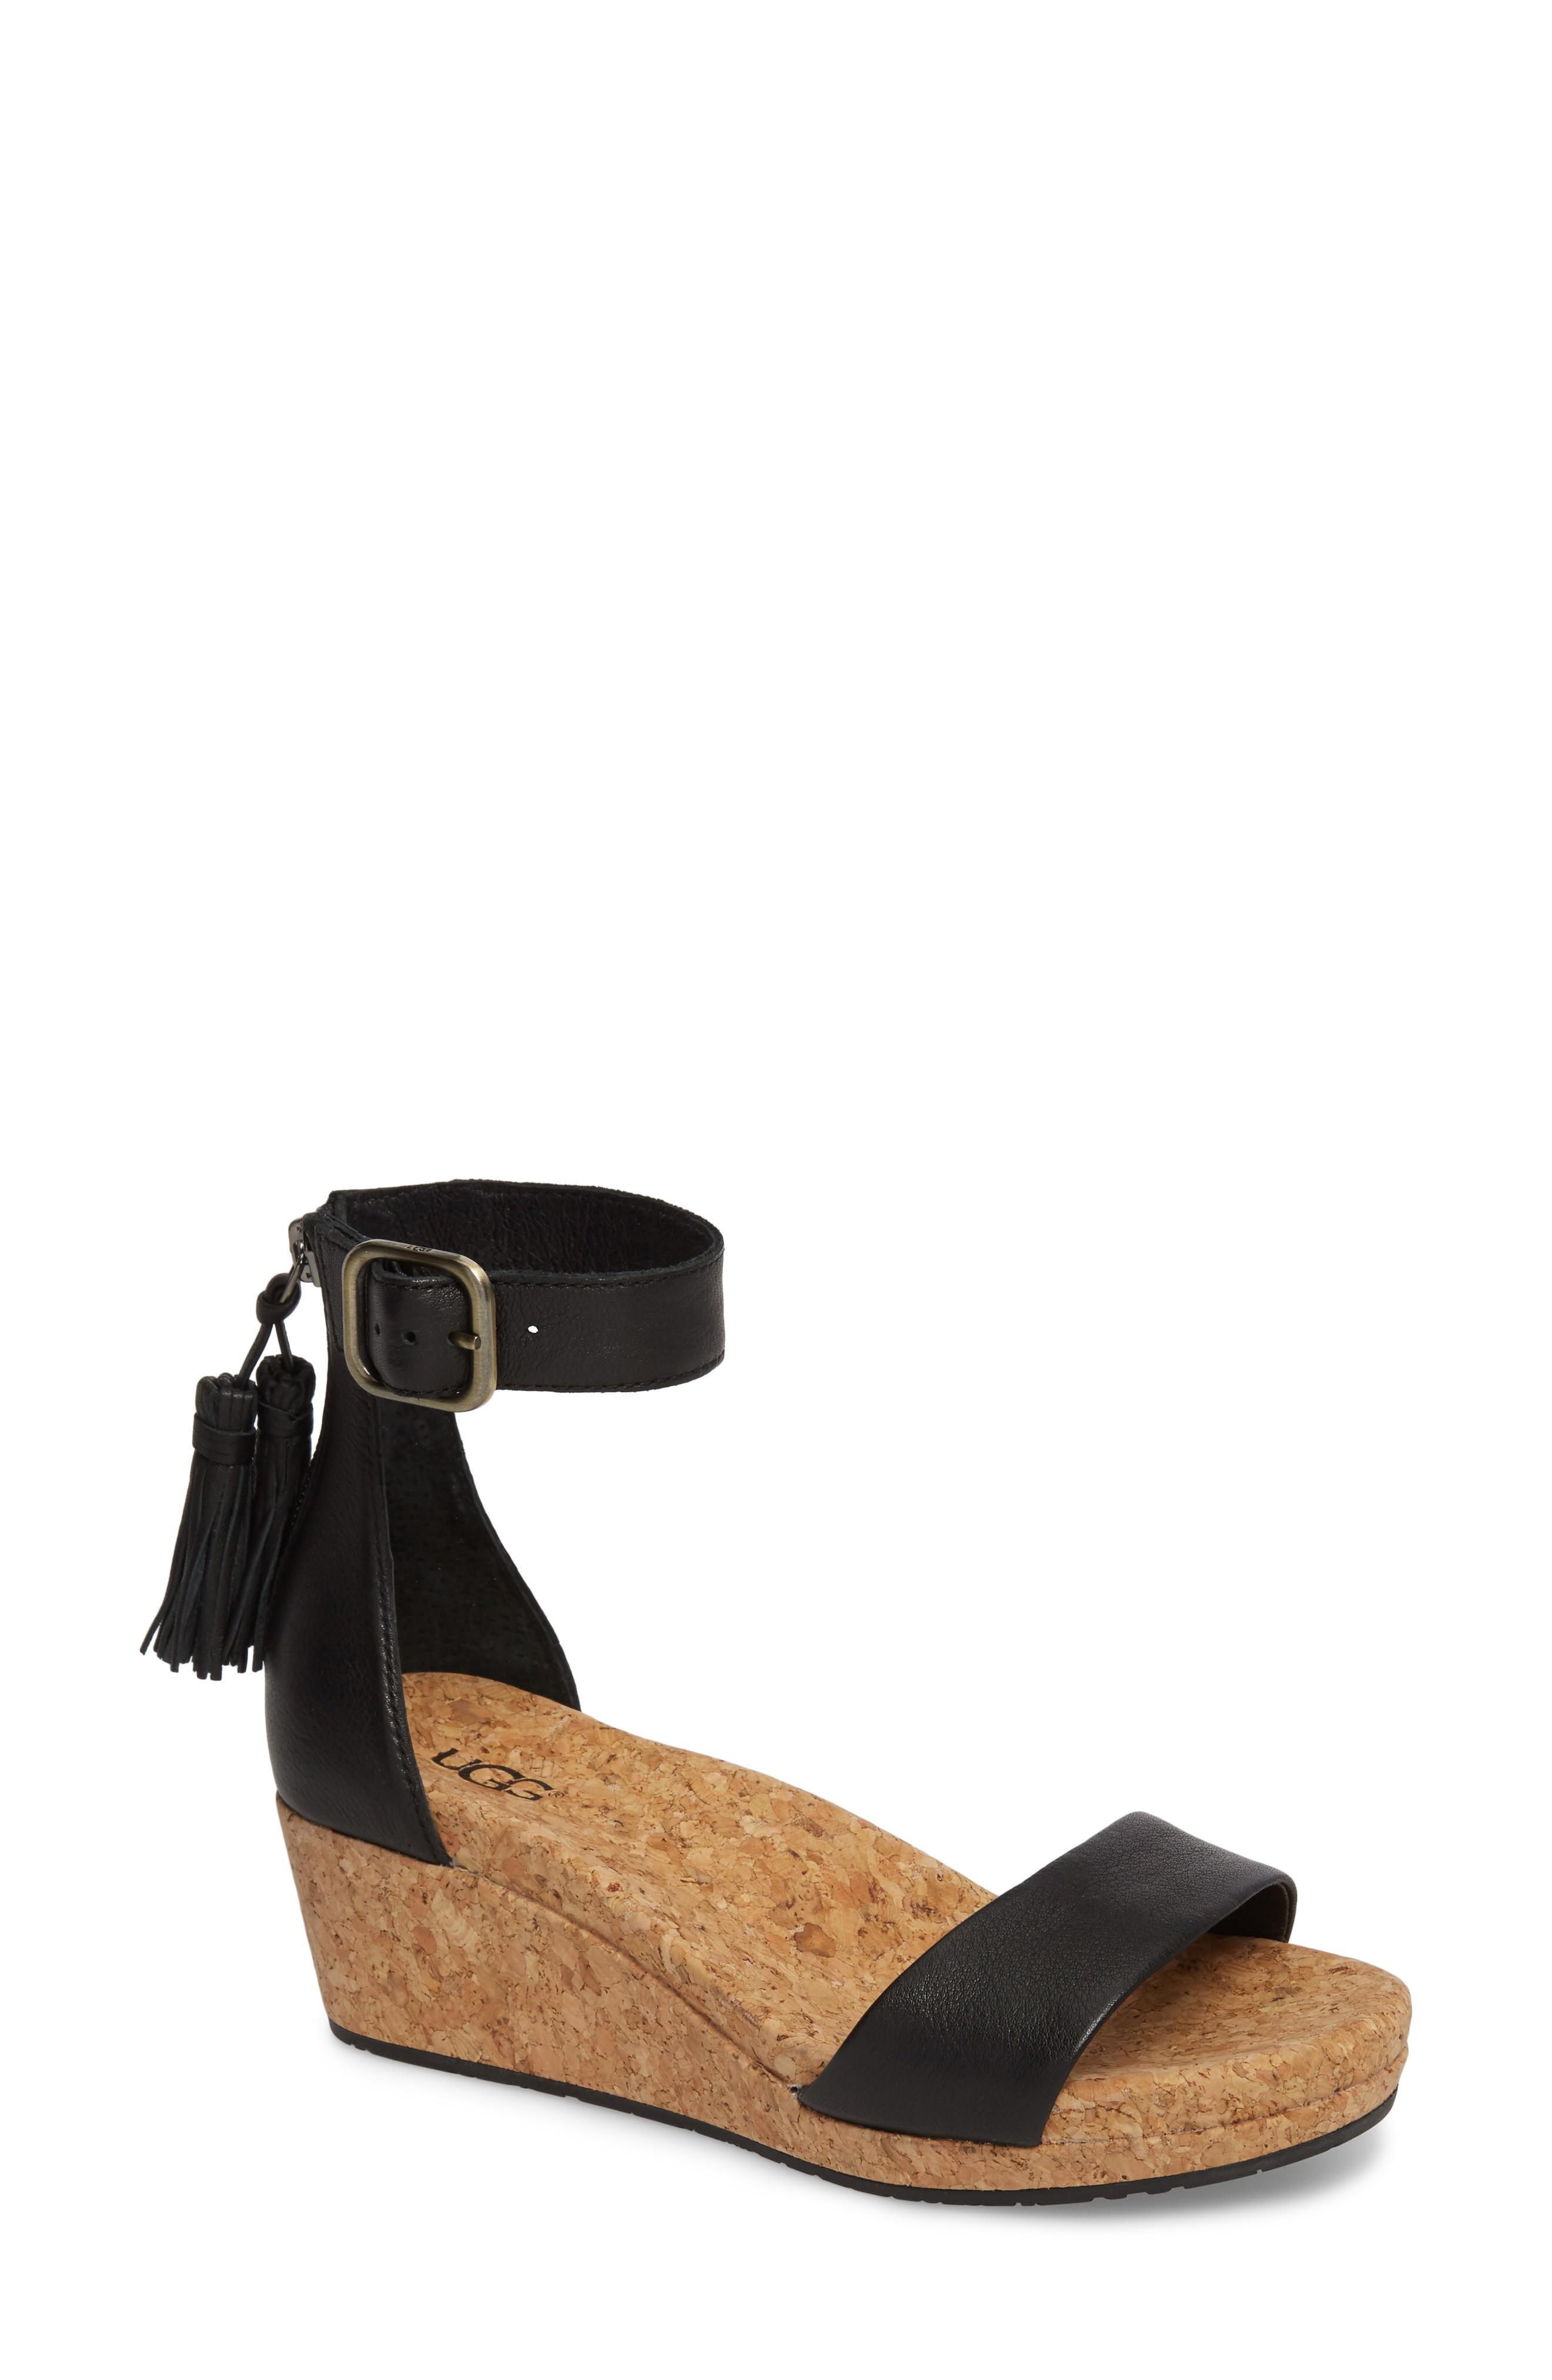 Ugg Zoe Wedge Sandal In Black Leather